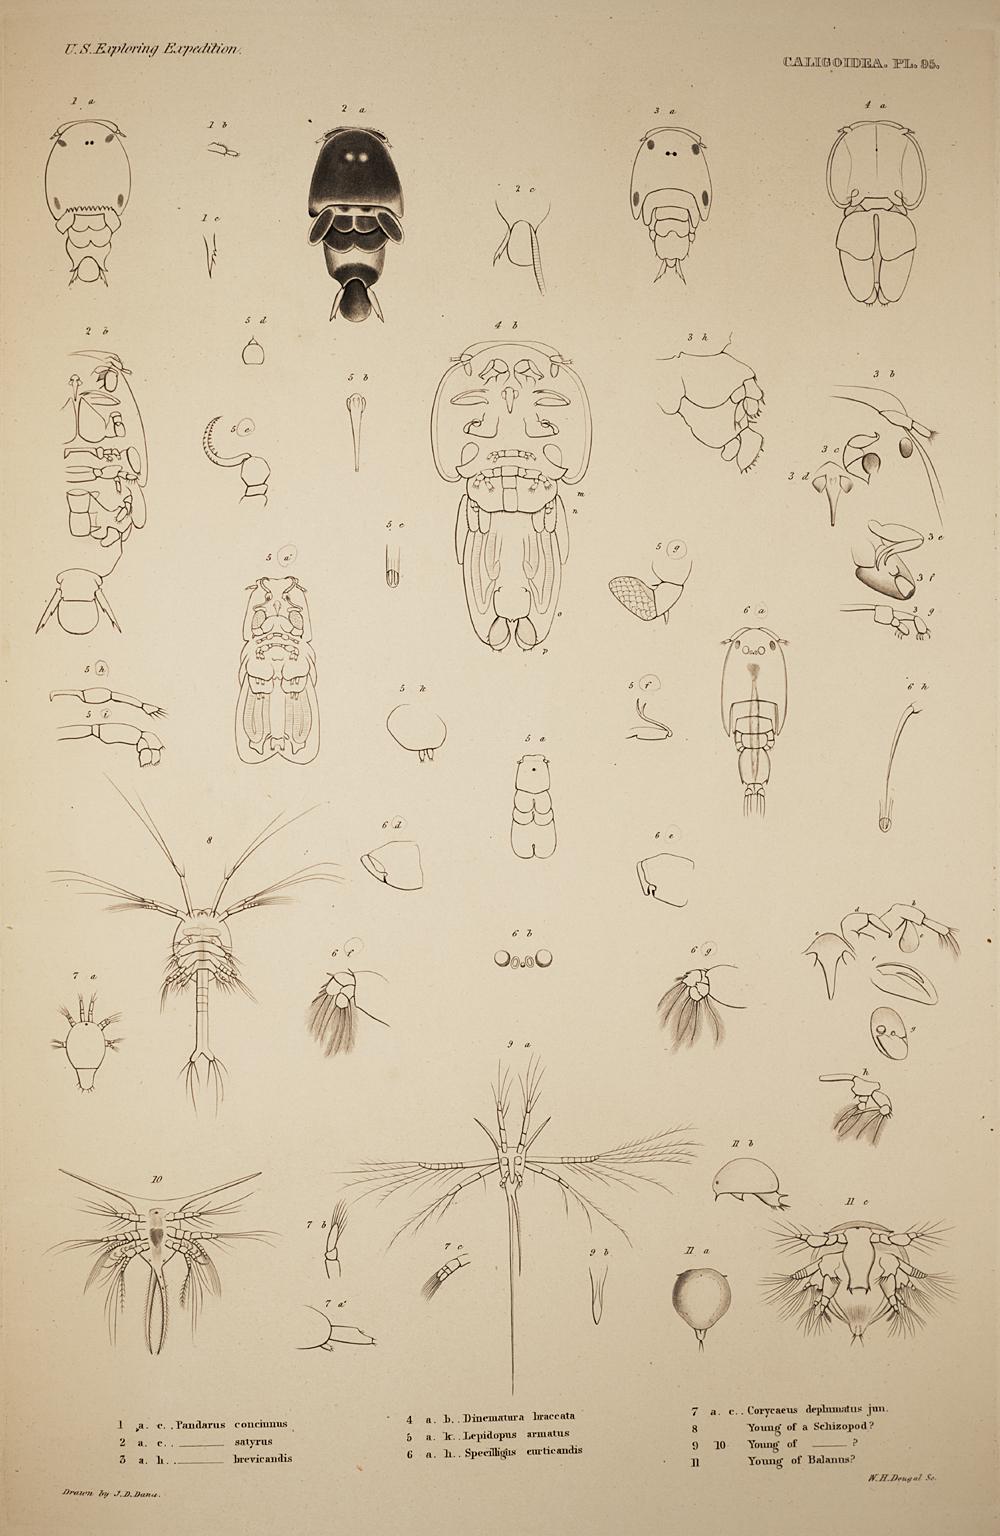 Caligoidea. Pl. 95,  Image number:SIL19-21-223b